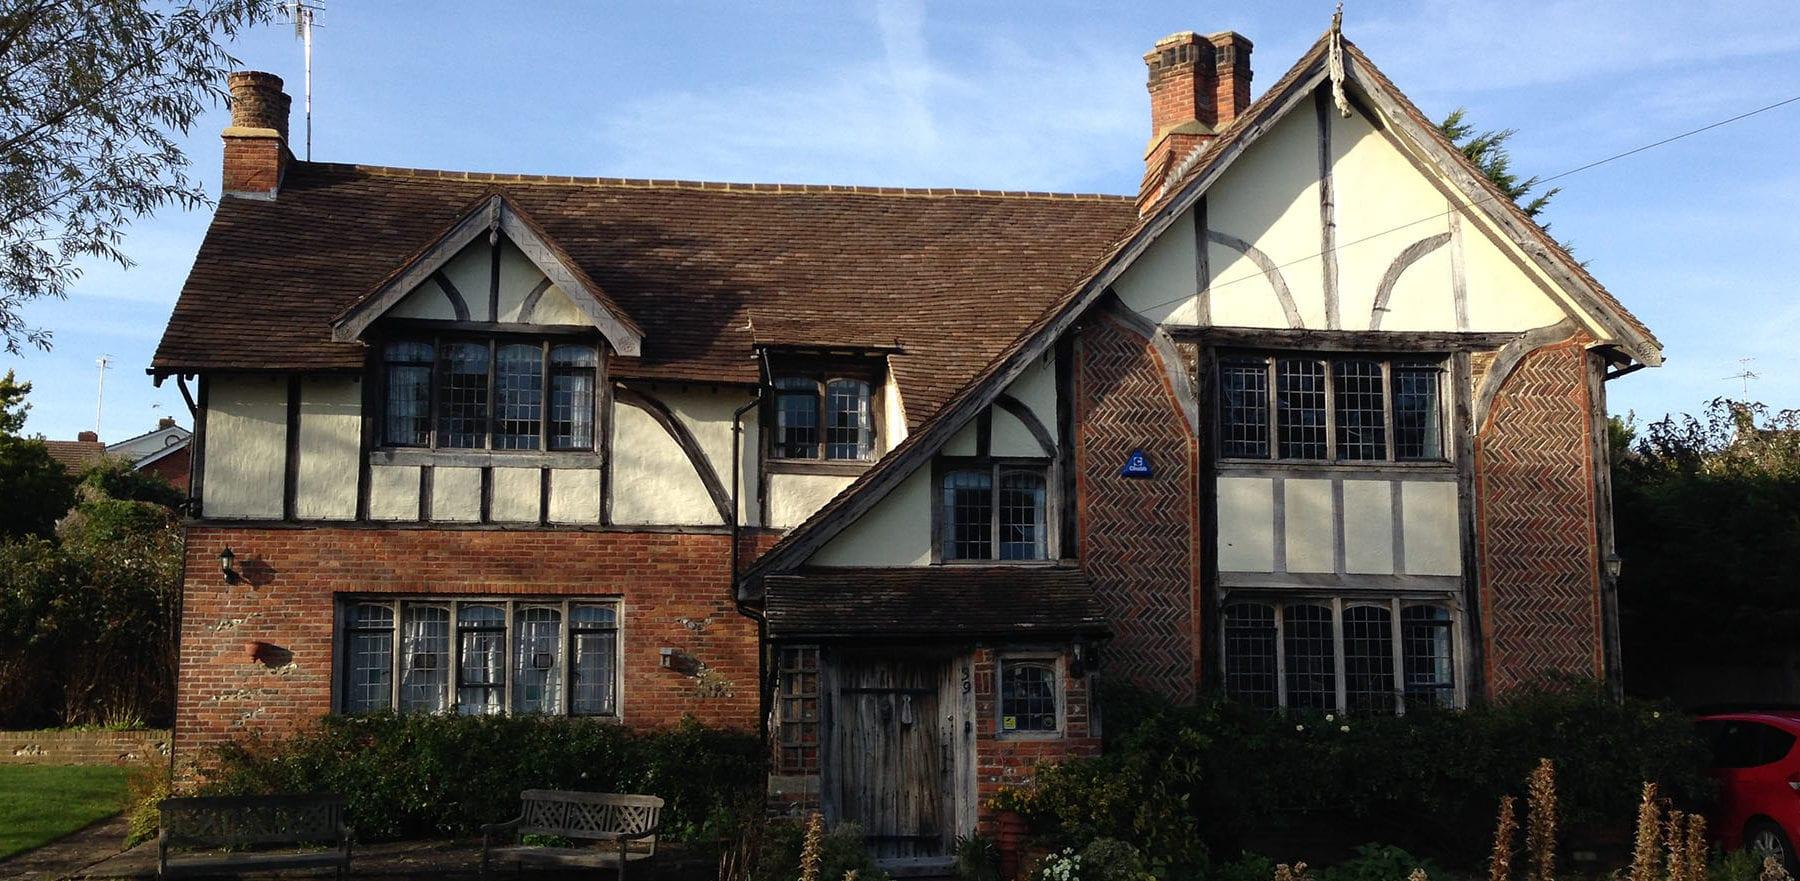 Lifestiles - Handmade Restoration Clay Roof Tiles - Brighton, England 4